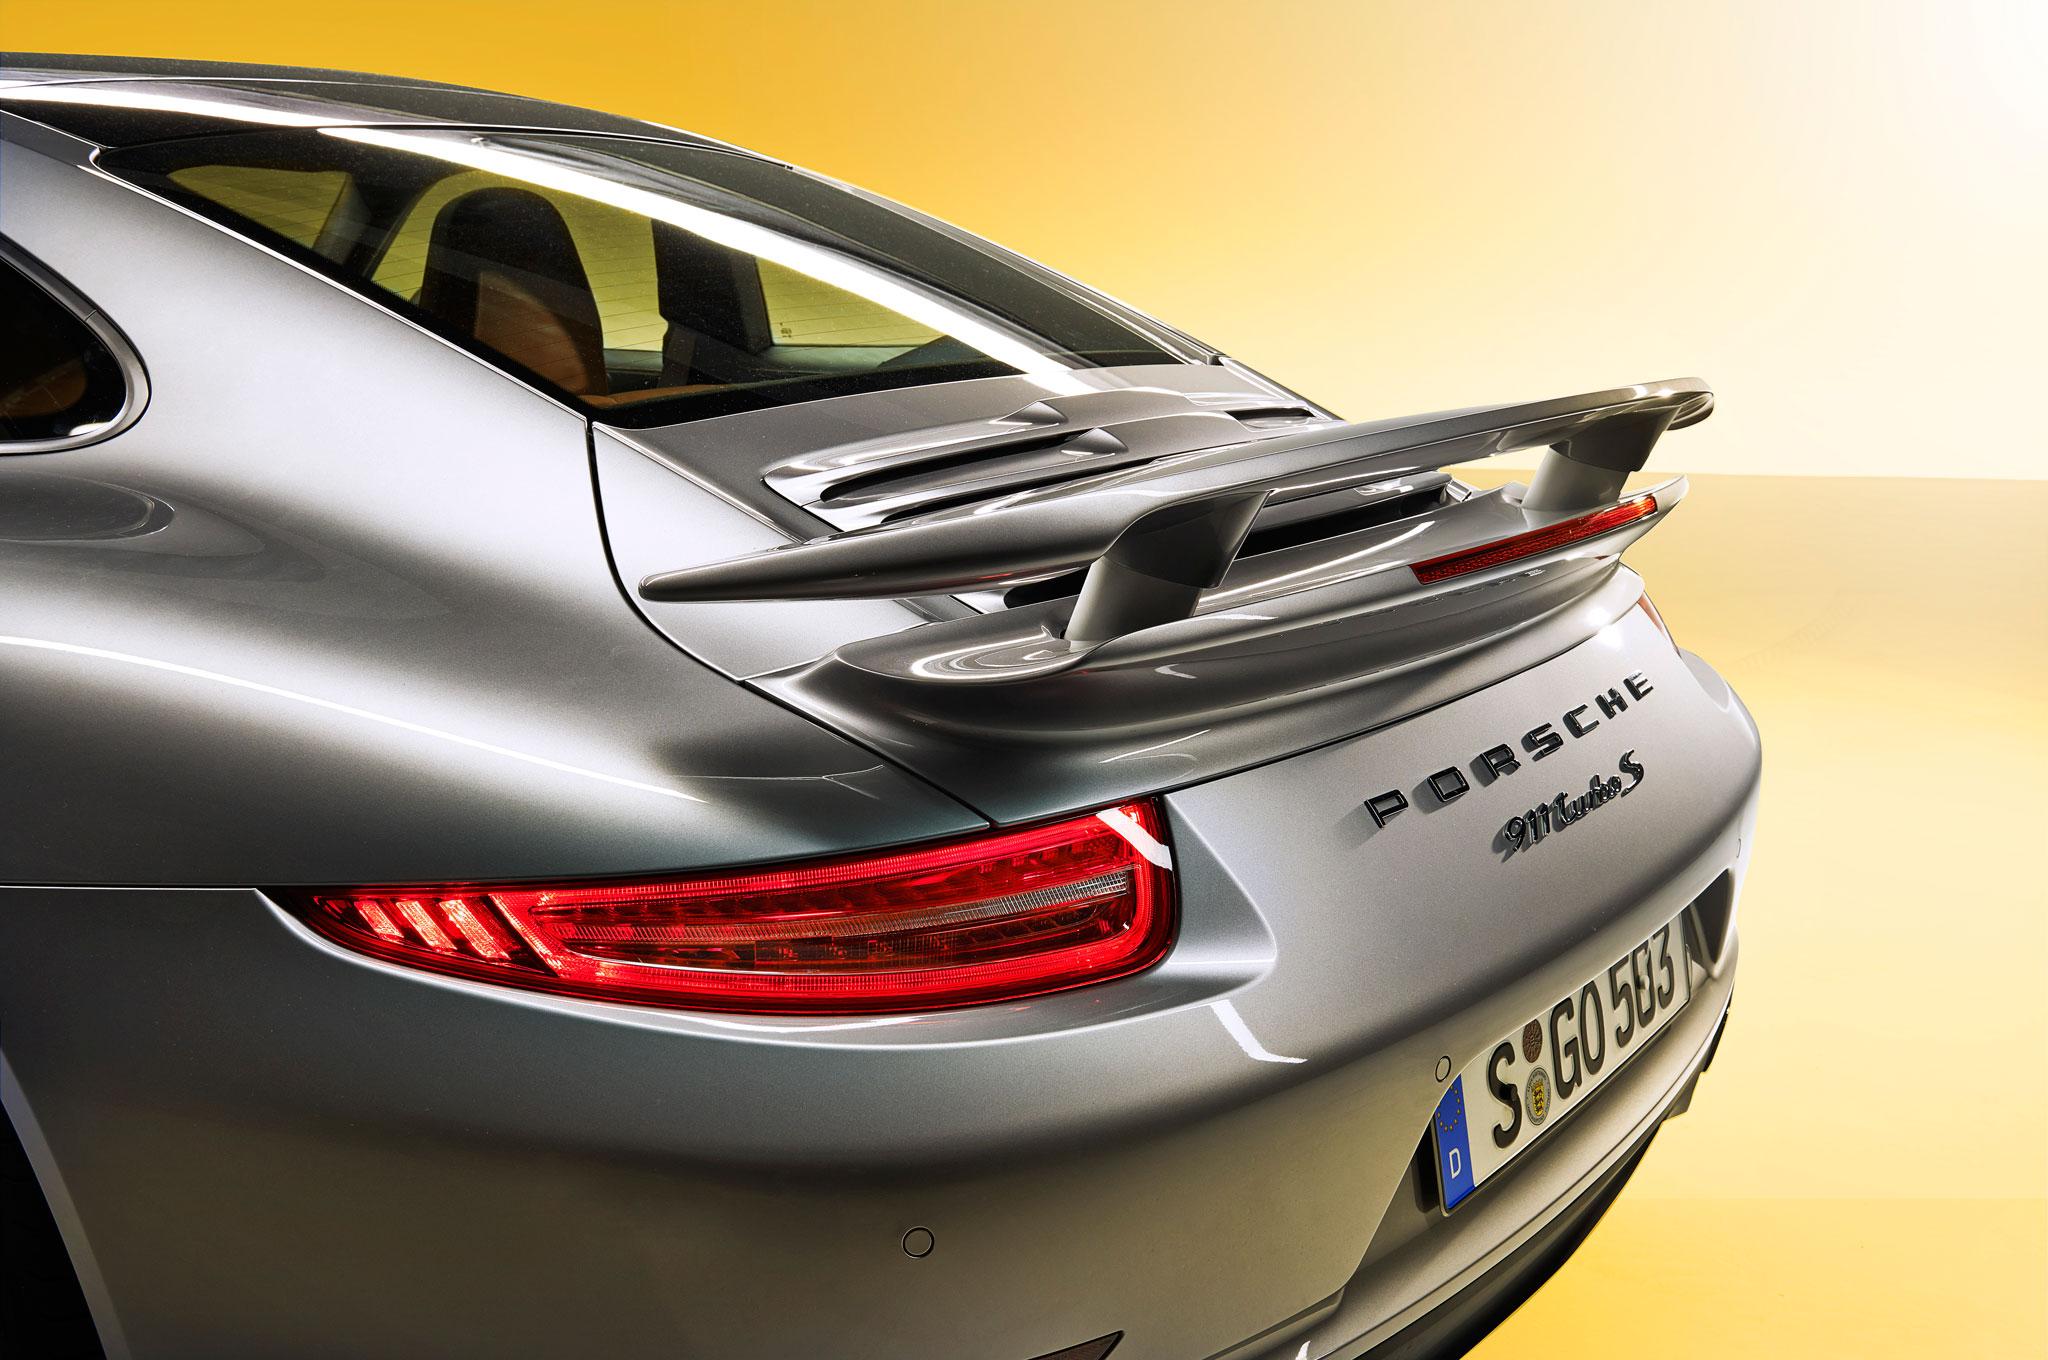 2014-Porsche-911-Turbo-spoiler-raised Exciting Porsche 911 Gt2 La Centrale Cars Trend